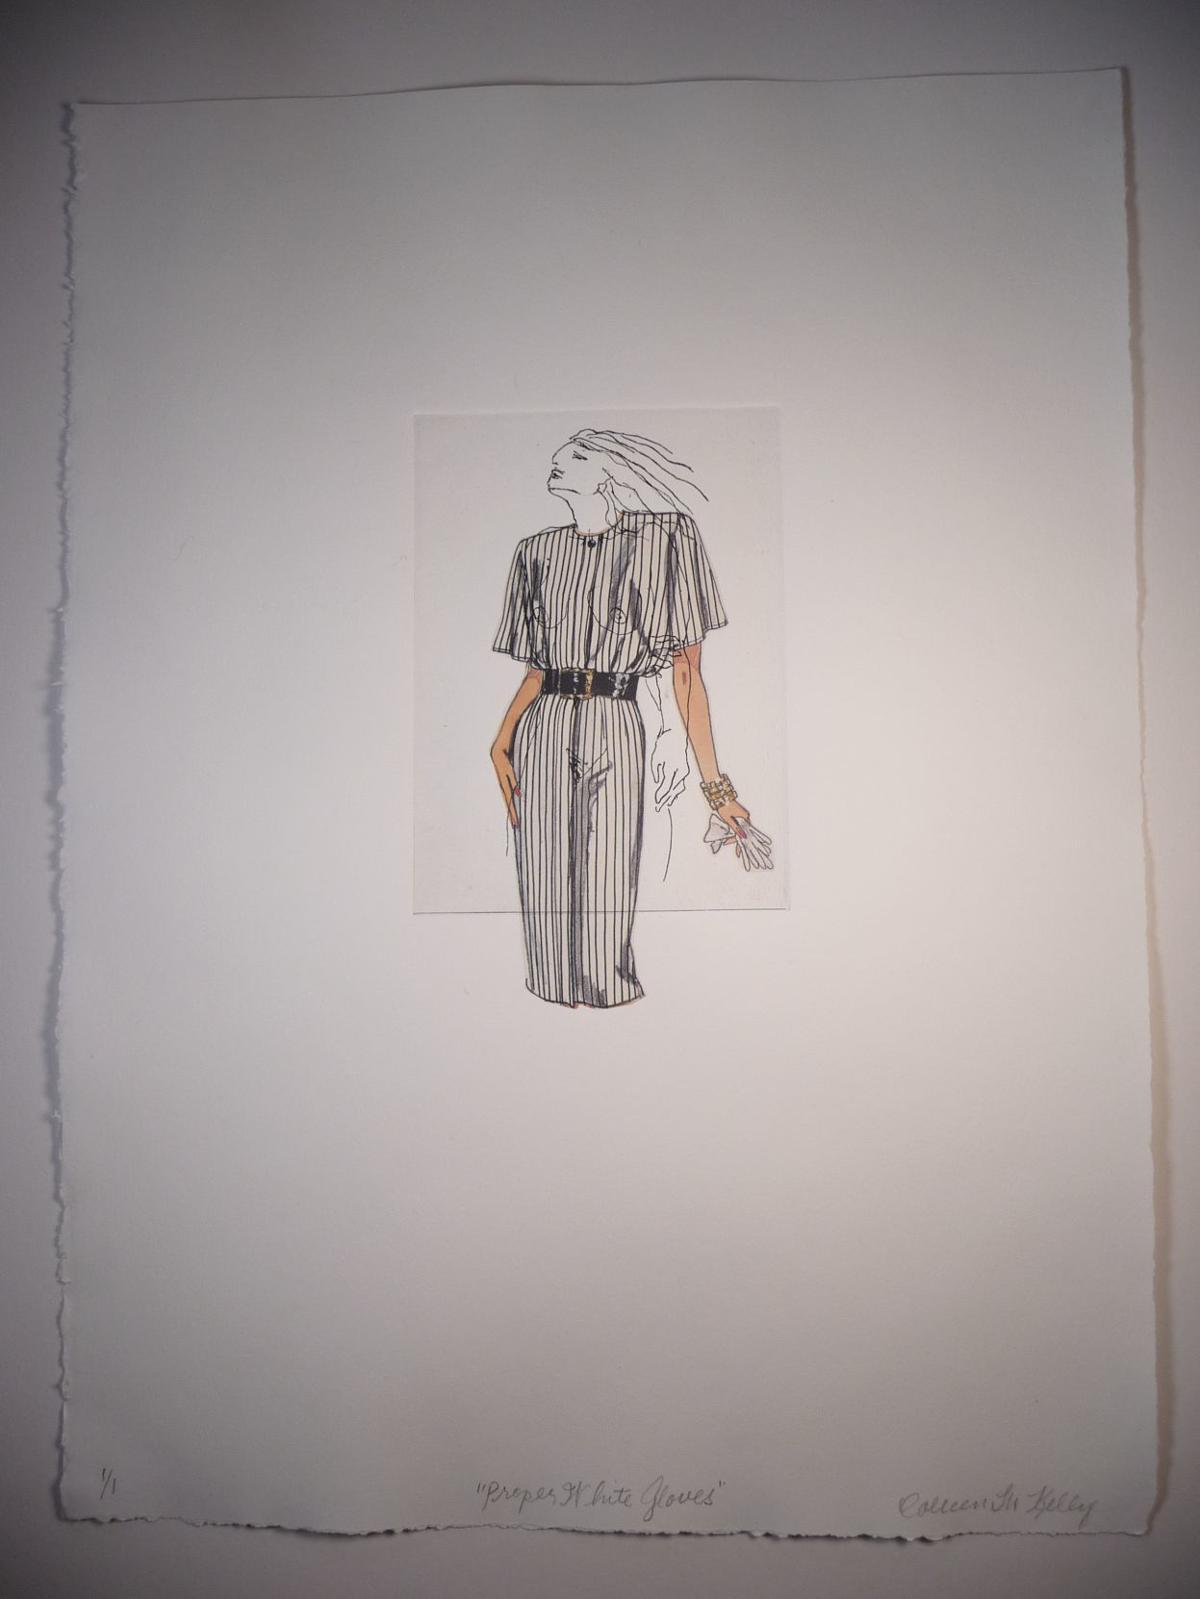 Art of dress 3